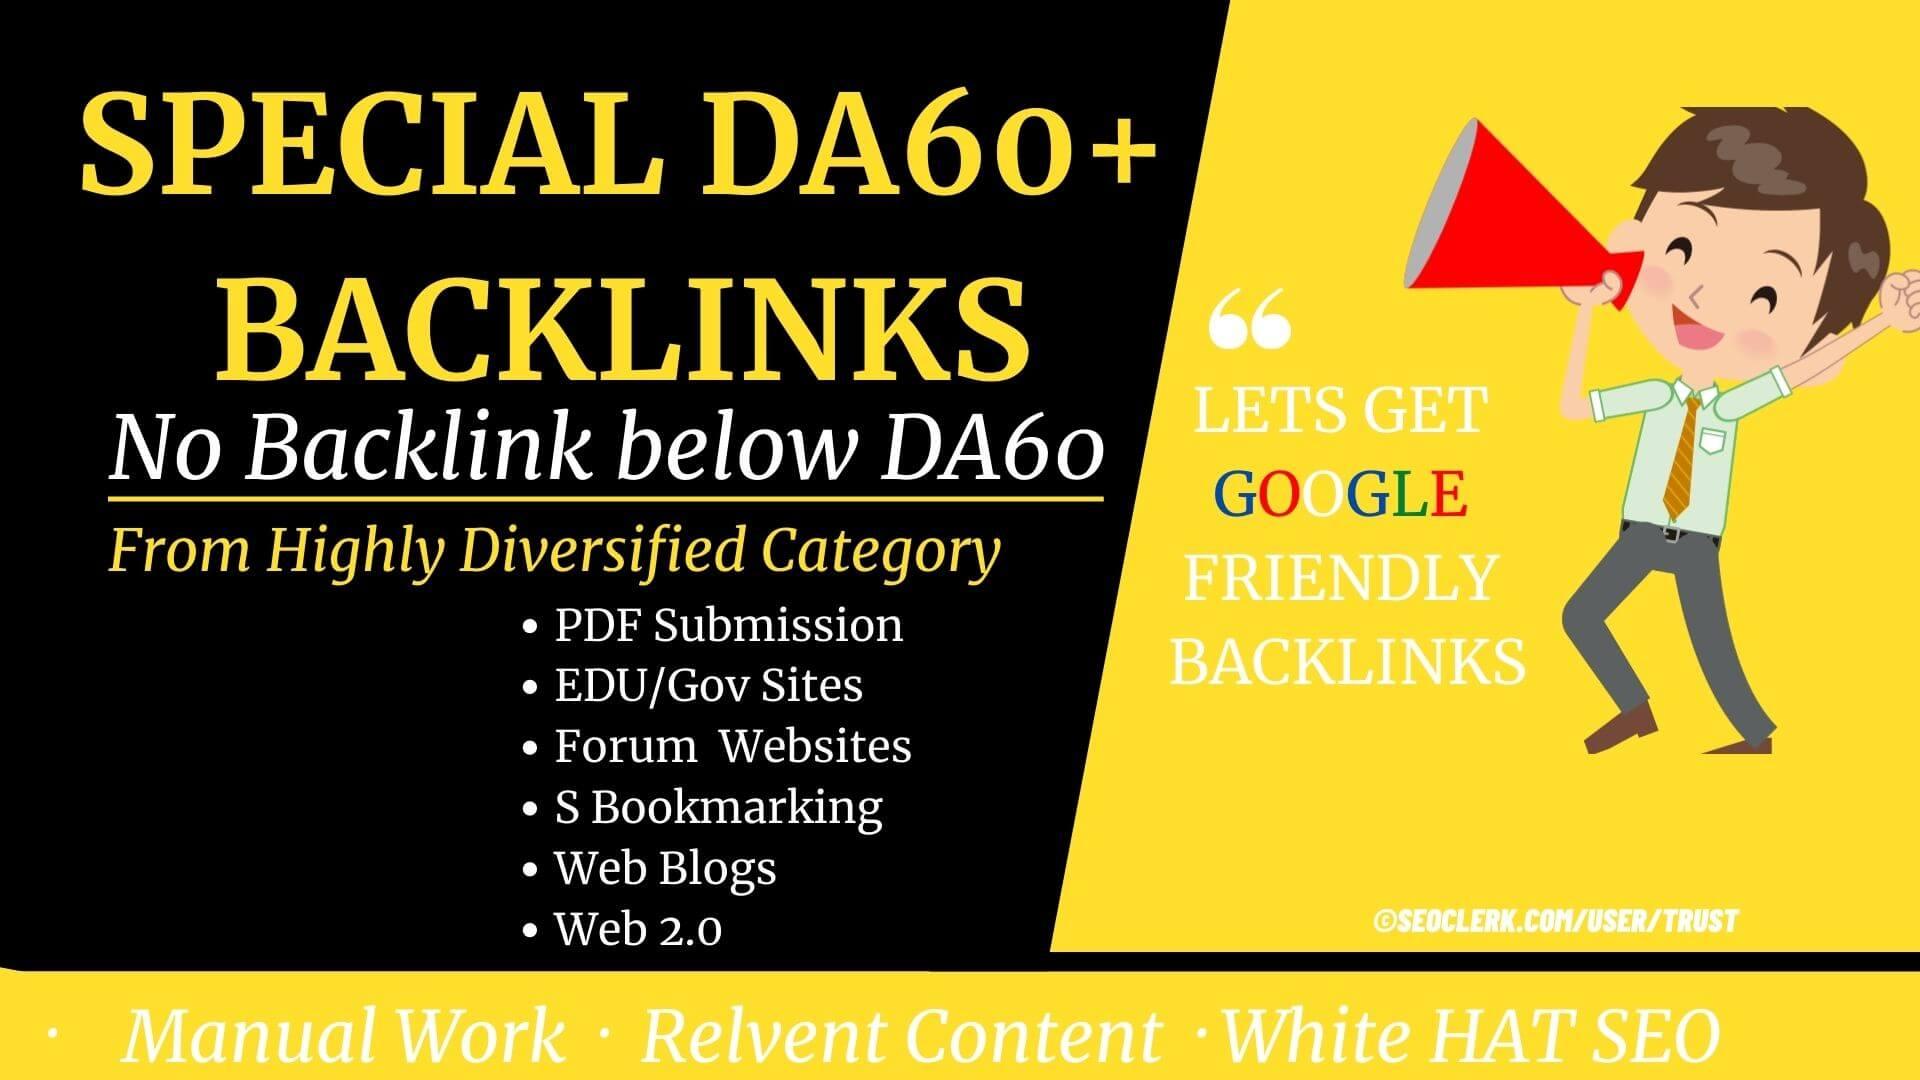 Only DA60+ Backlinks- 103 contextual Backlinks for high competition keyword- High DA PA TF CF sites